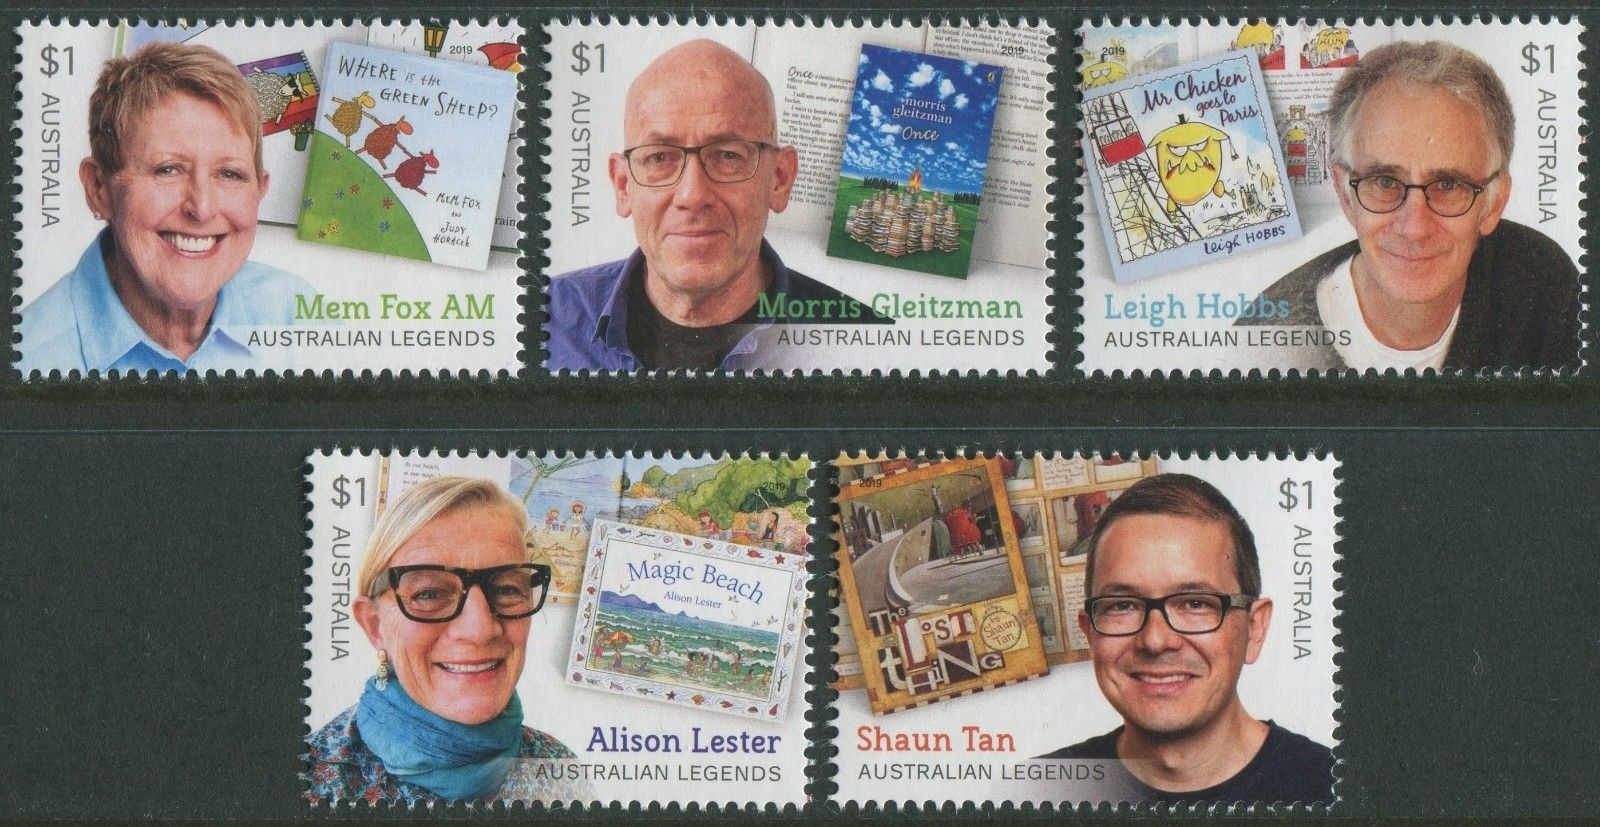 Australia - Australian Legends of Children's Literature (January 17, 2019)